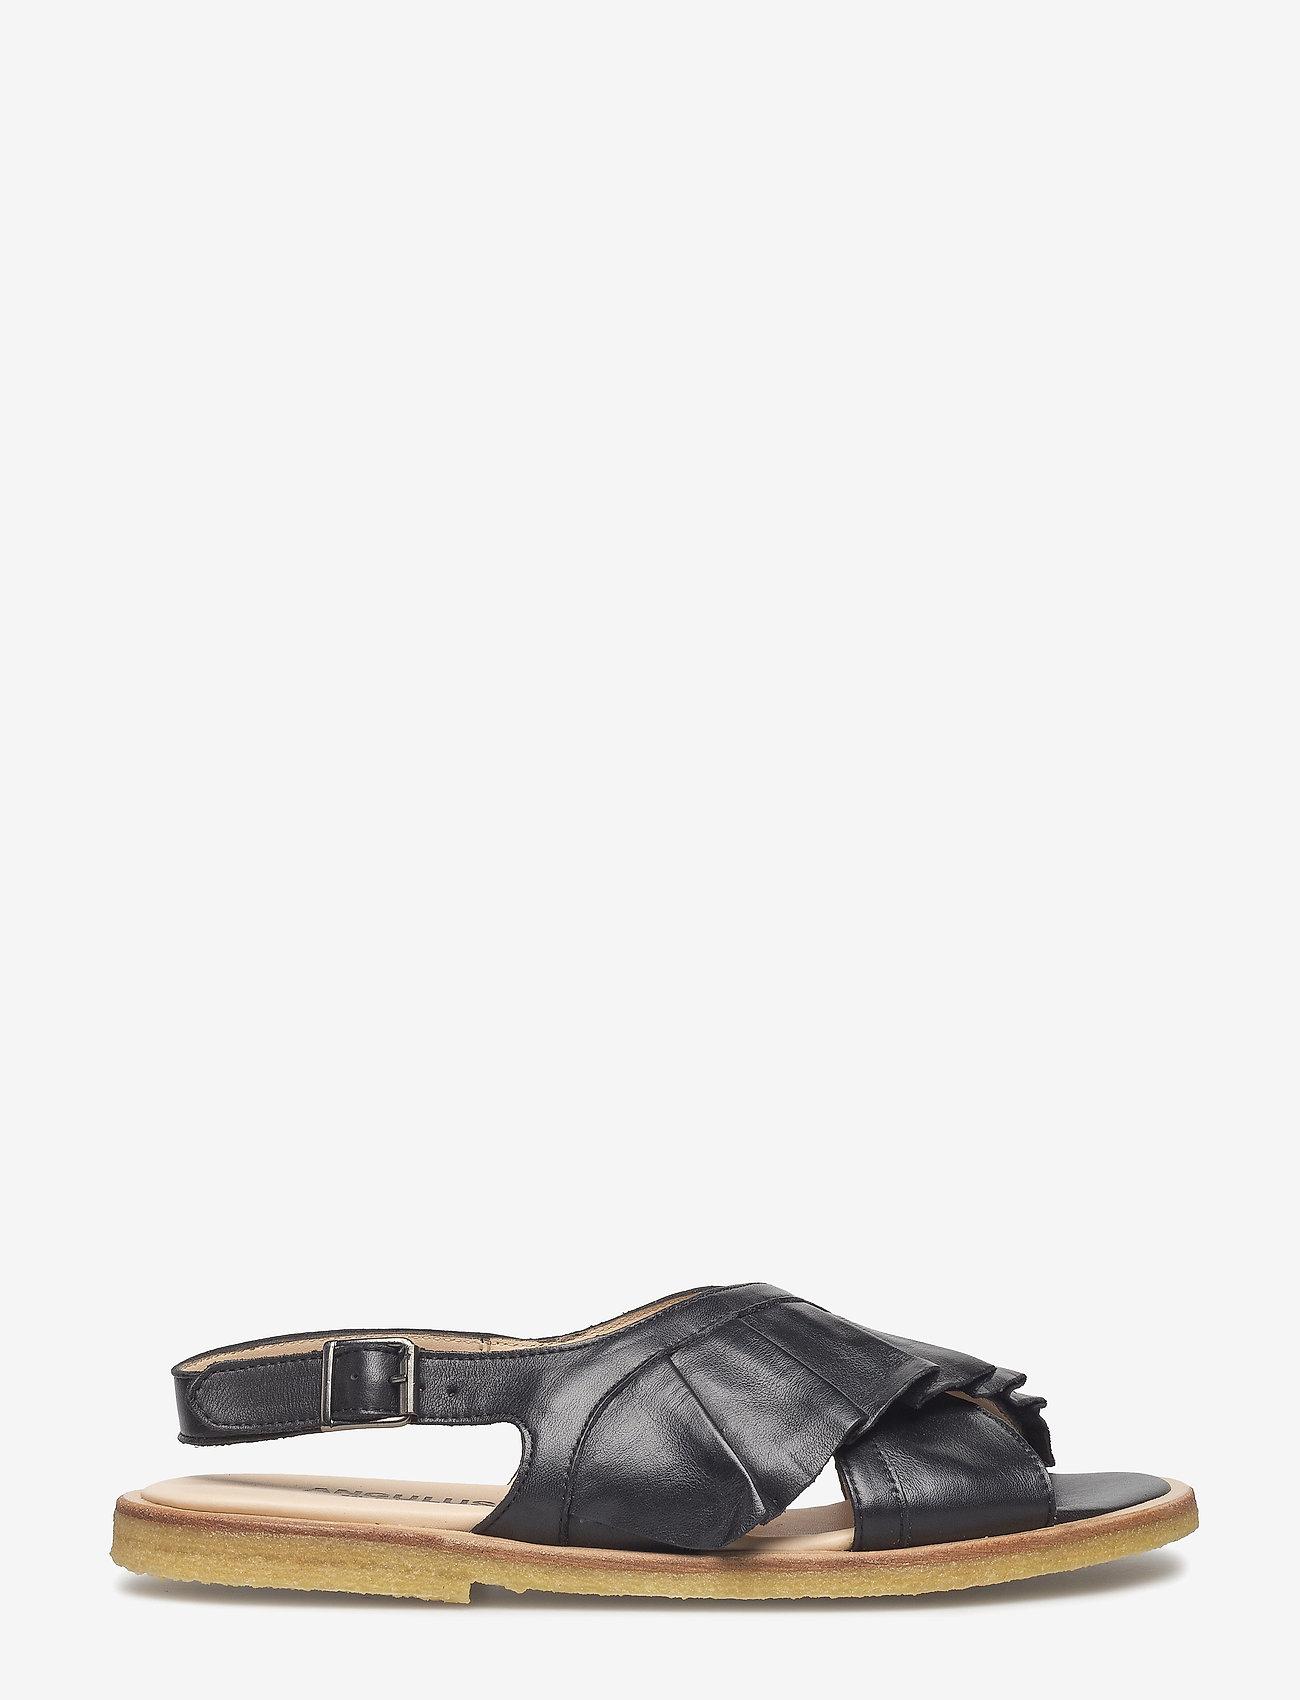 ANGULUS - Sandals - flat - flache sandalen - 1604 black - 1